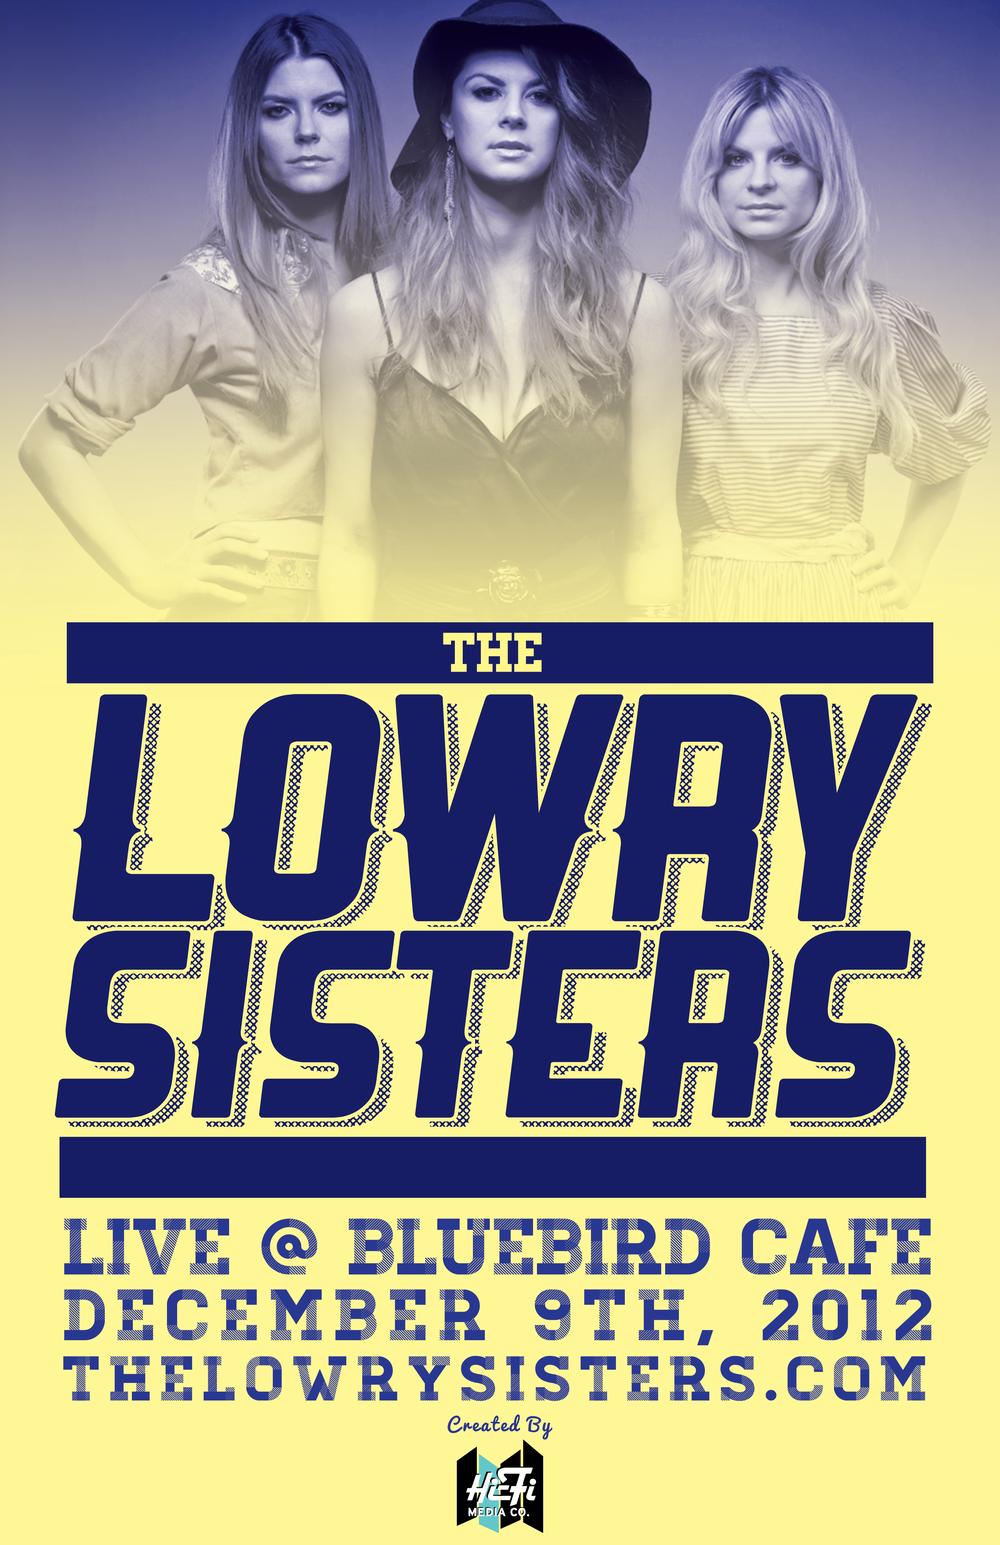 Nashville (Television Show) Bluebird Cafe Poster